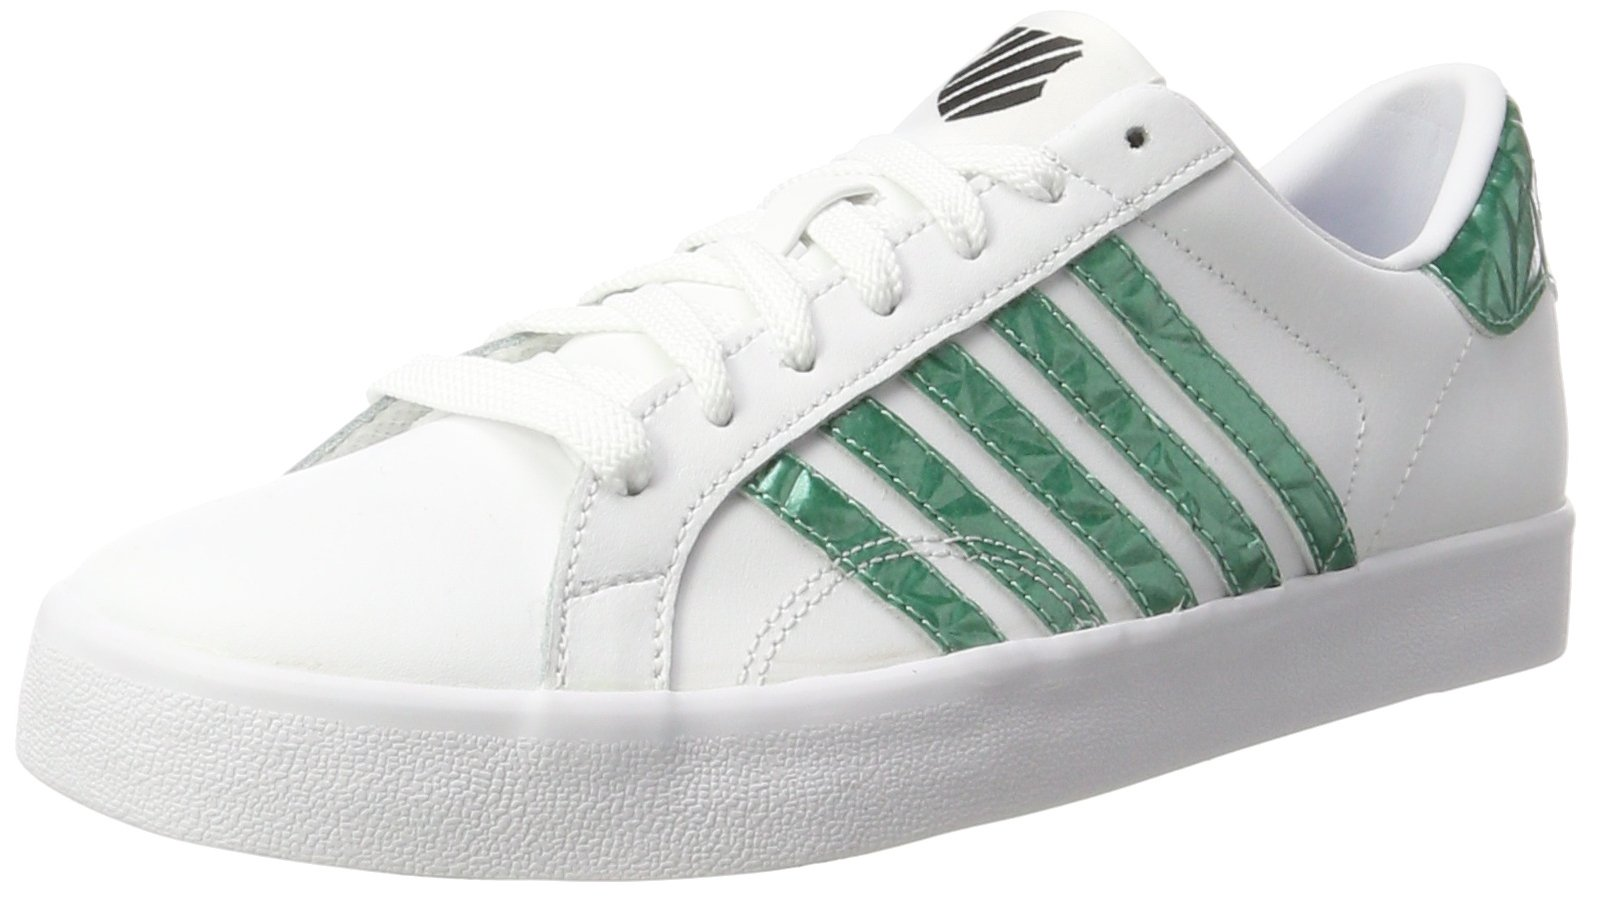 Eu swiss Green37 Belmont SoSneakers Basses FemmeBlancwhite K emerald rxQtdCsh